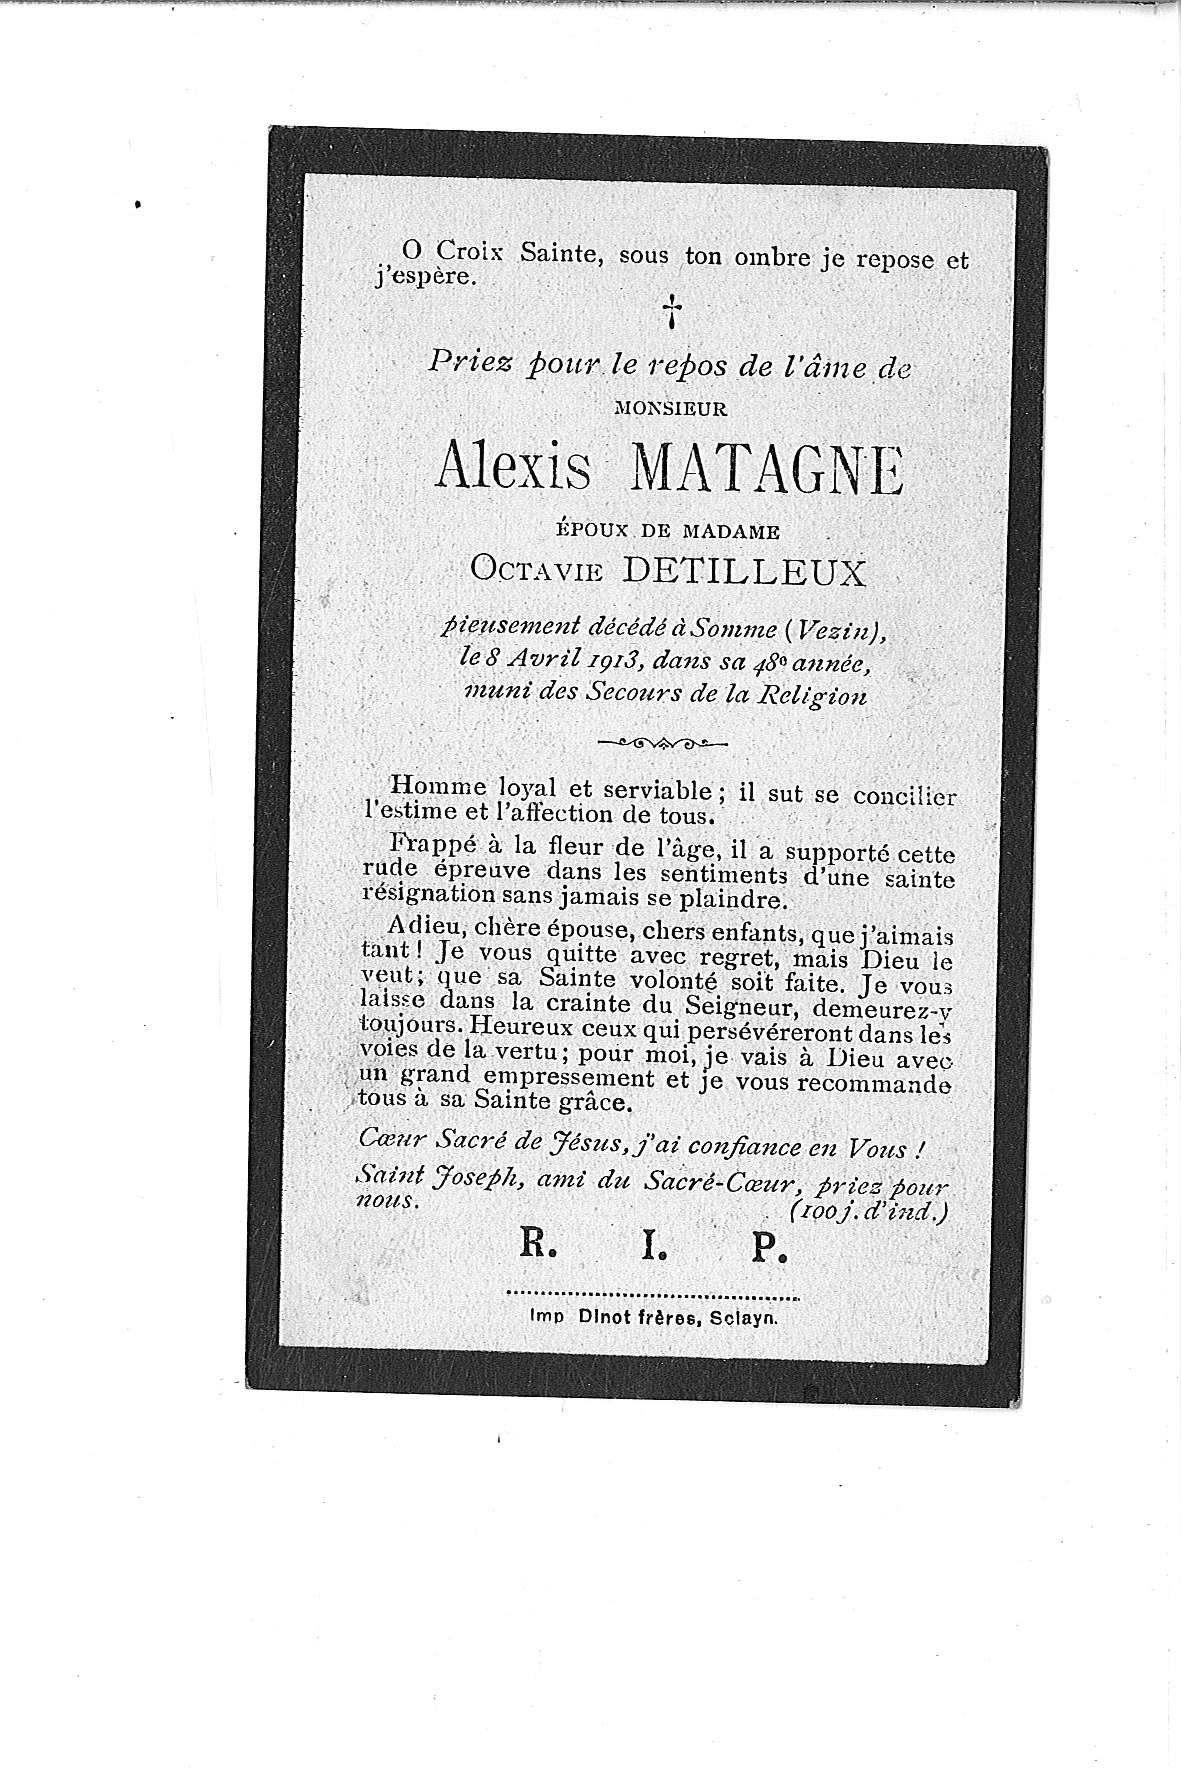 Alexis(1913)20120412120820_00002.jpg